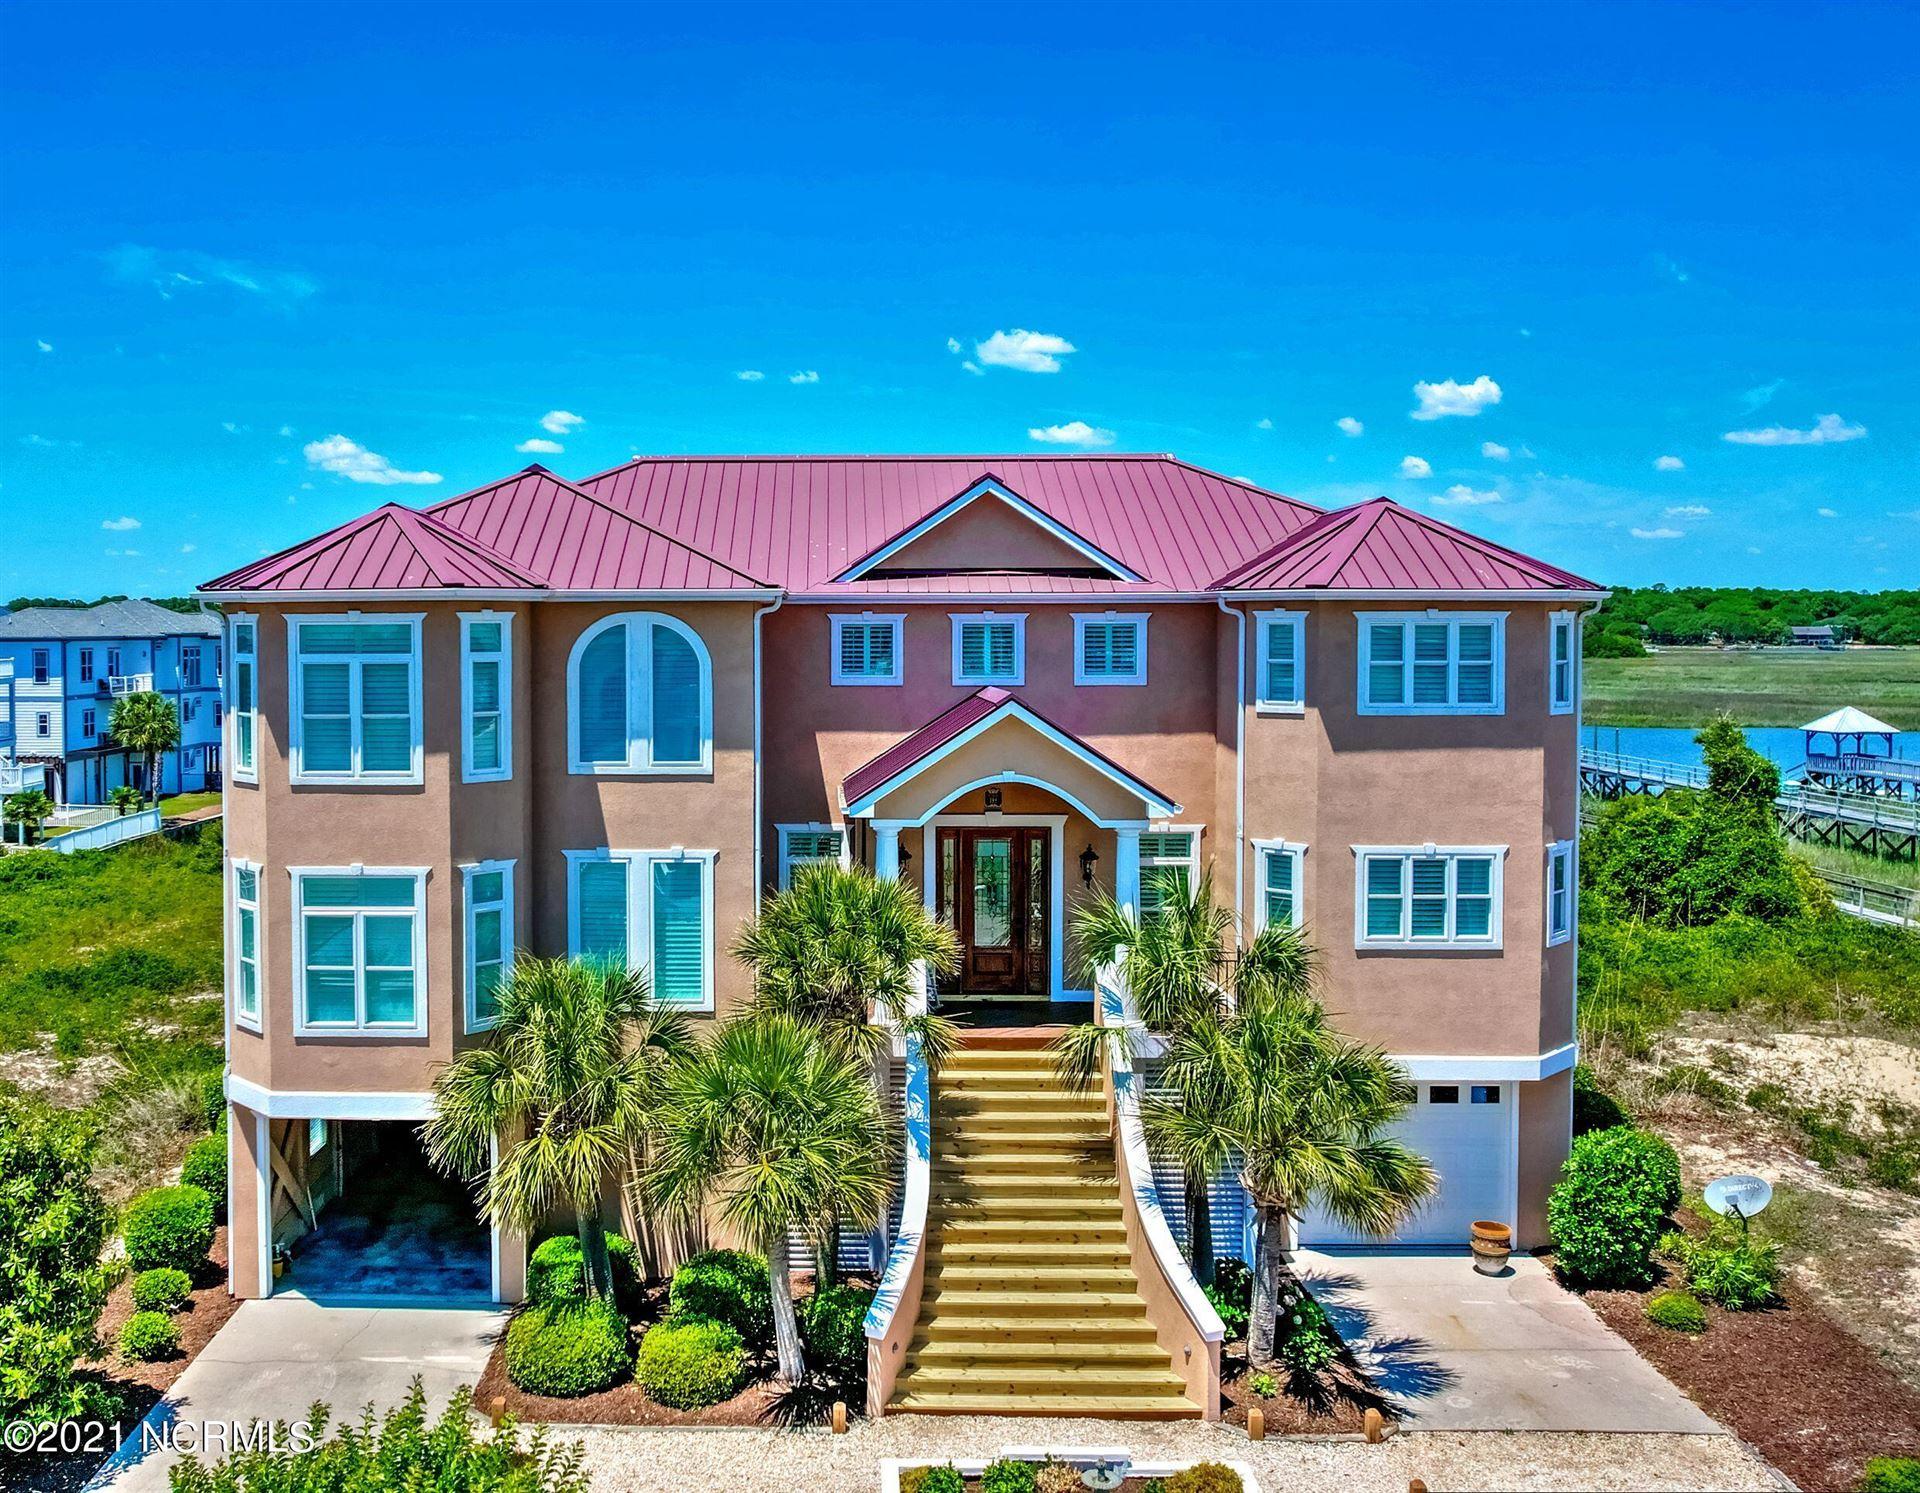 Photo of 198 W Fourth Street, Ocean Isle Beach, NC 28469 (MLS # 100273498)